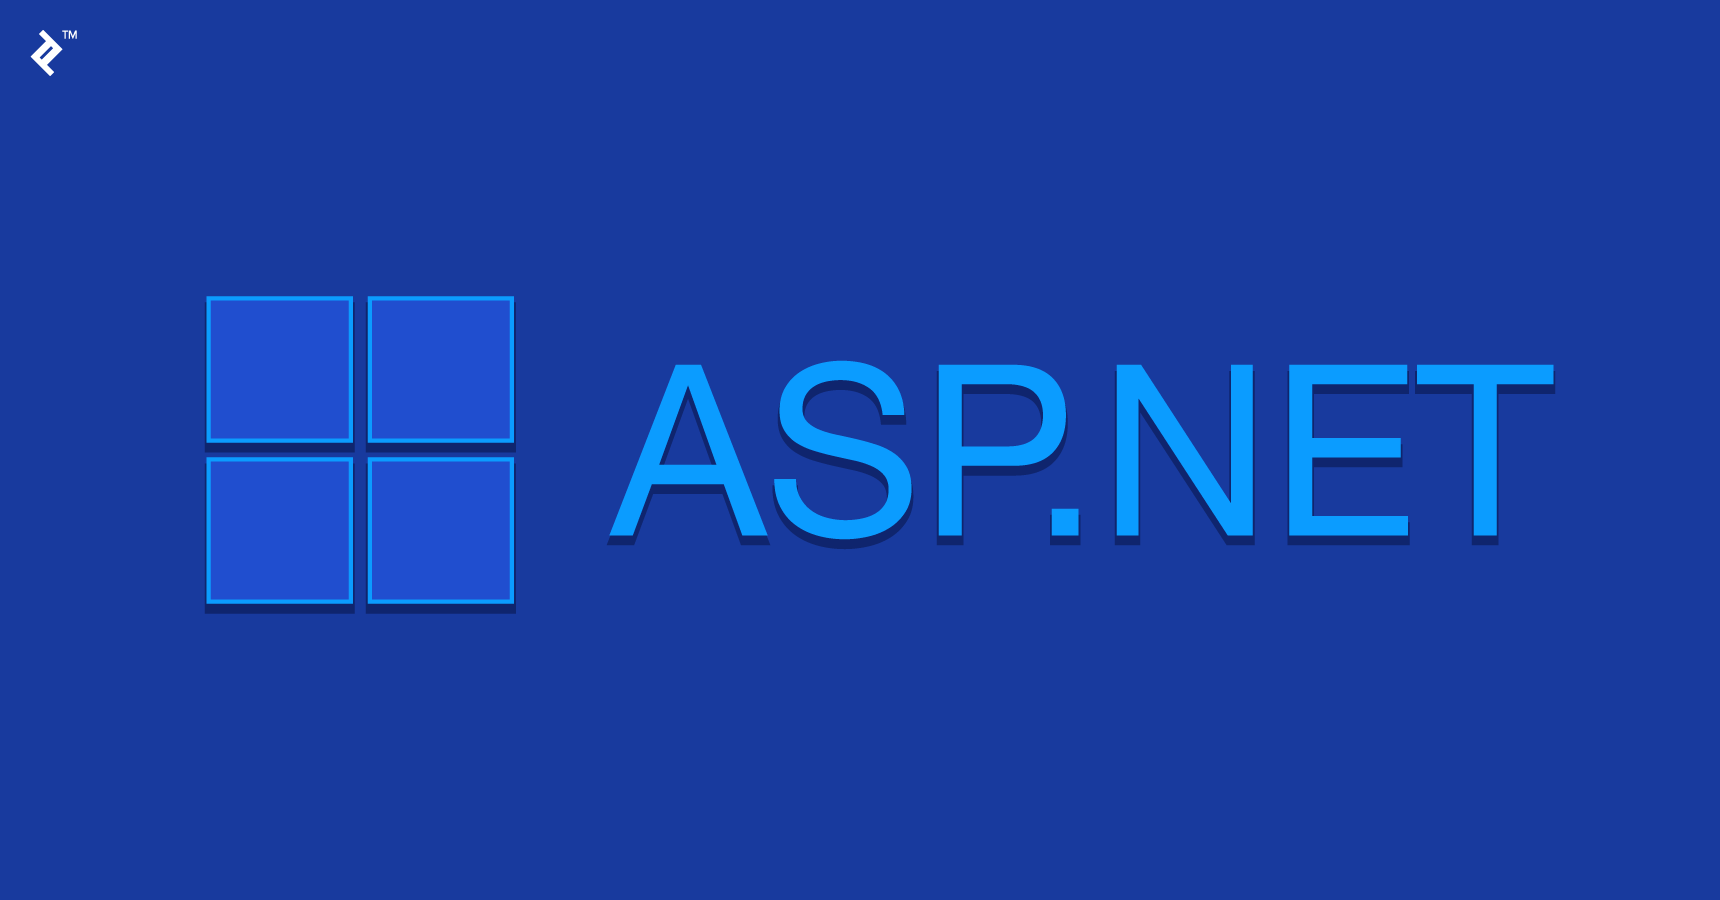 ASP NET Developer Job Description Template | Toptal